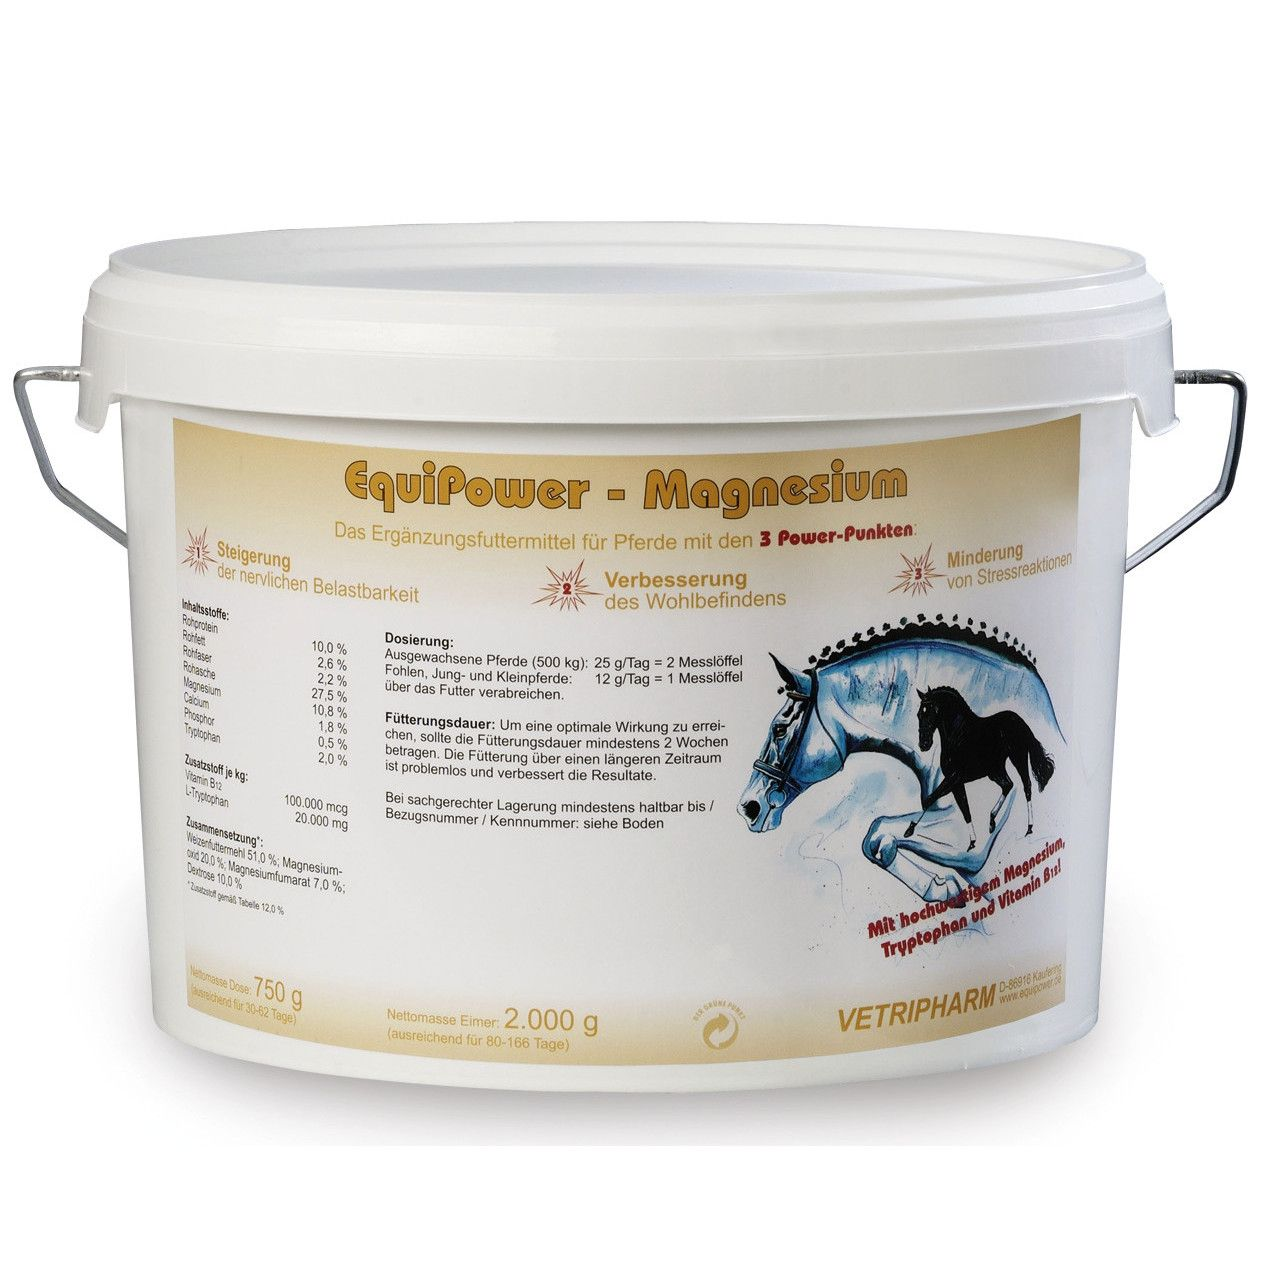 Vetripharm EquiPower Magnesium